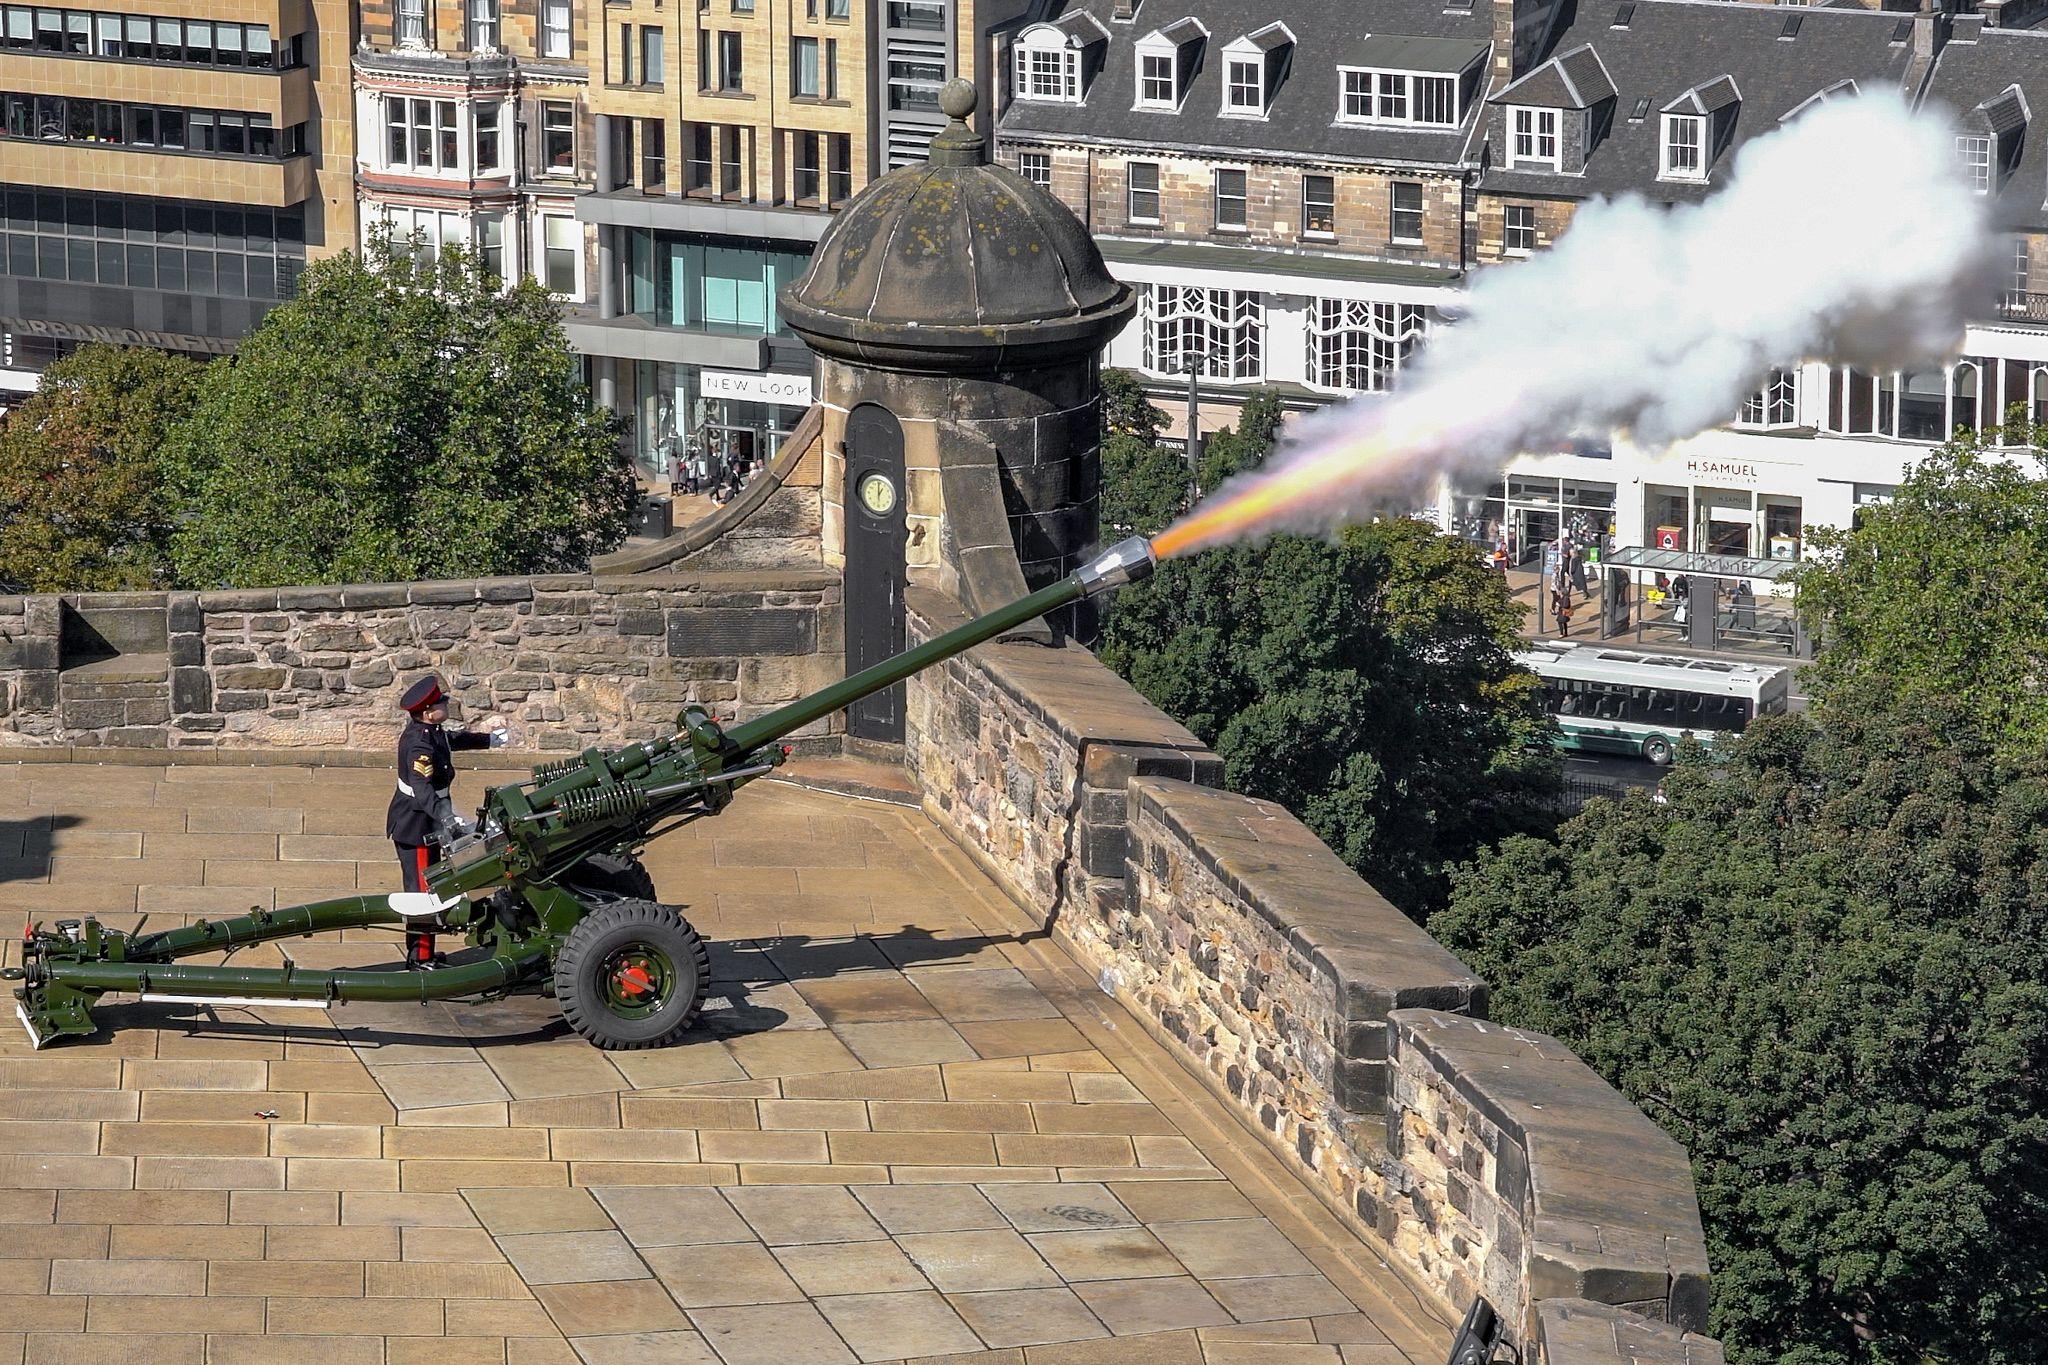 Edinburgh Castle's One O'Clock Gun